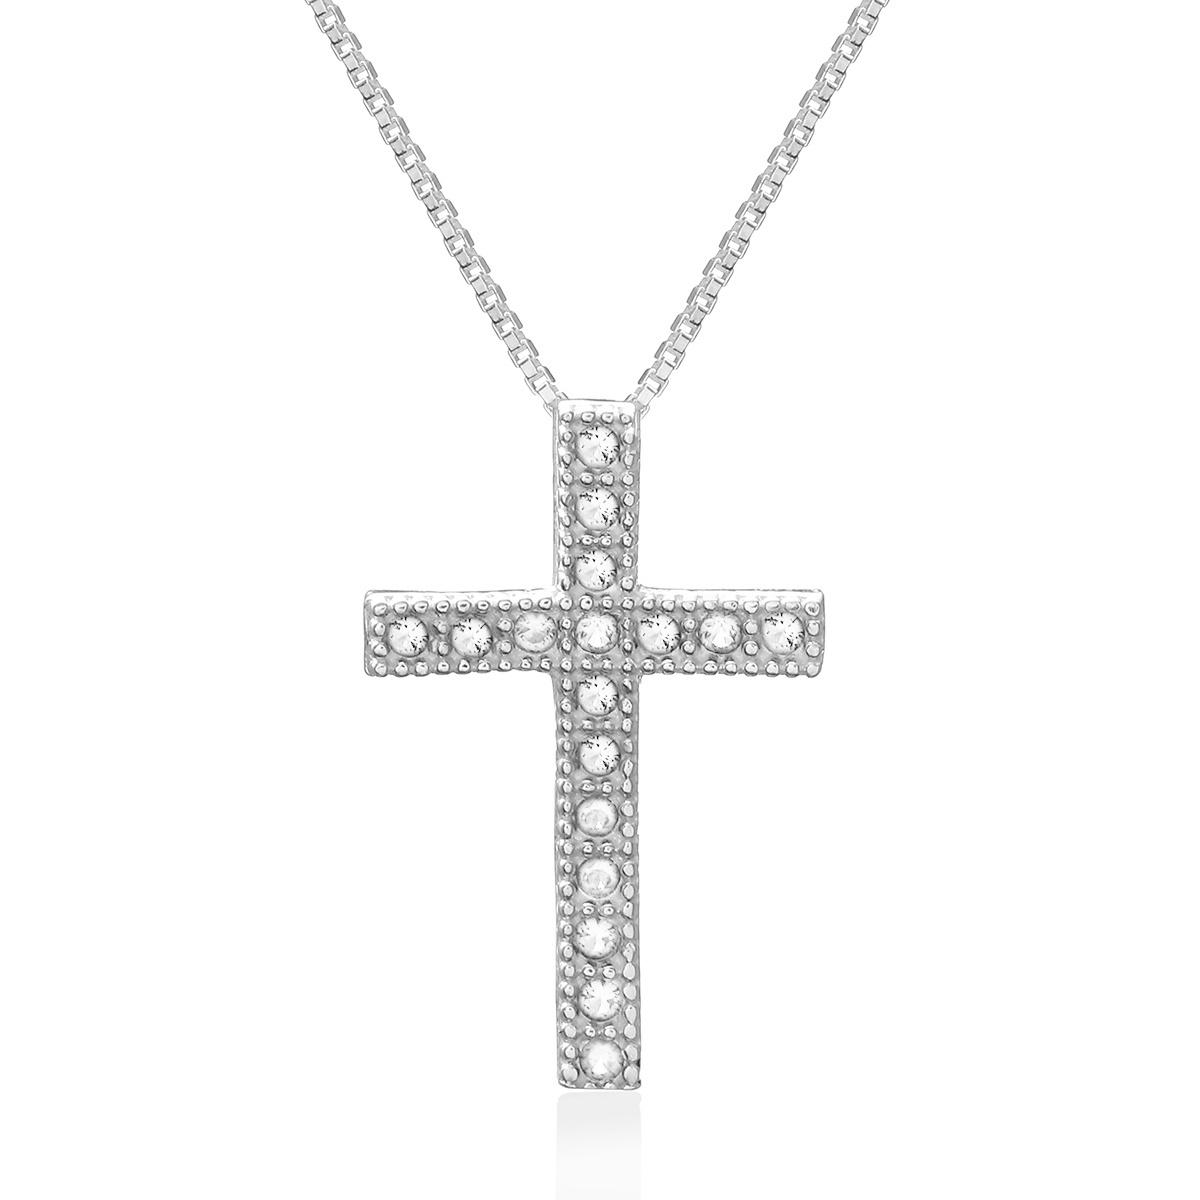 Colar Crucifixo Cravejado Branco Prata 925